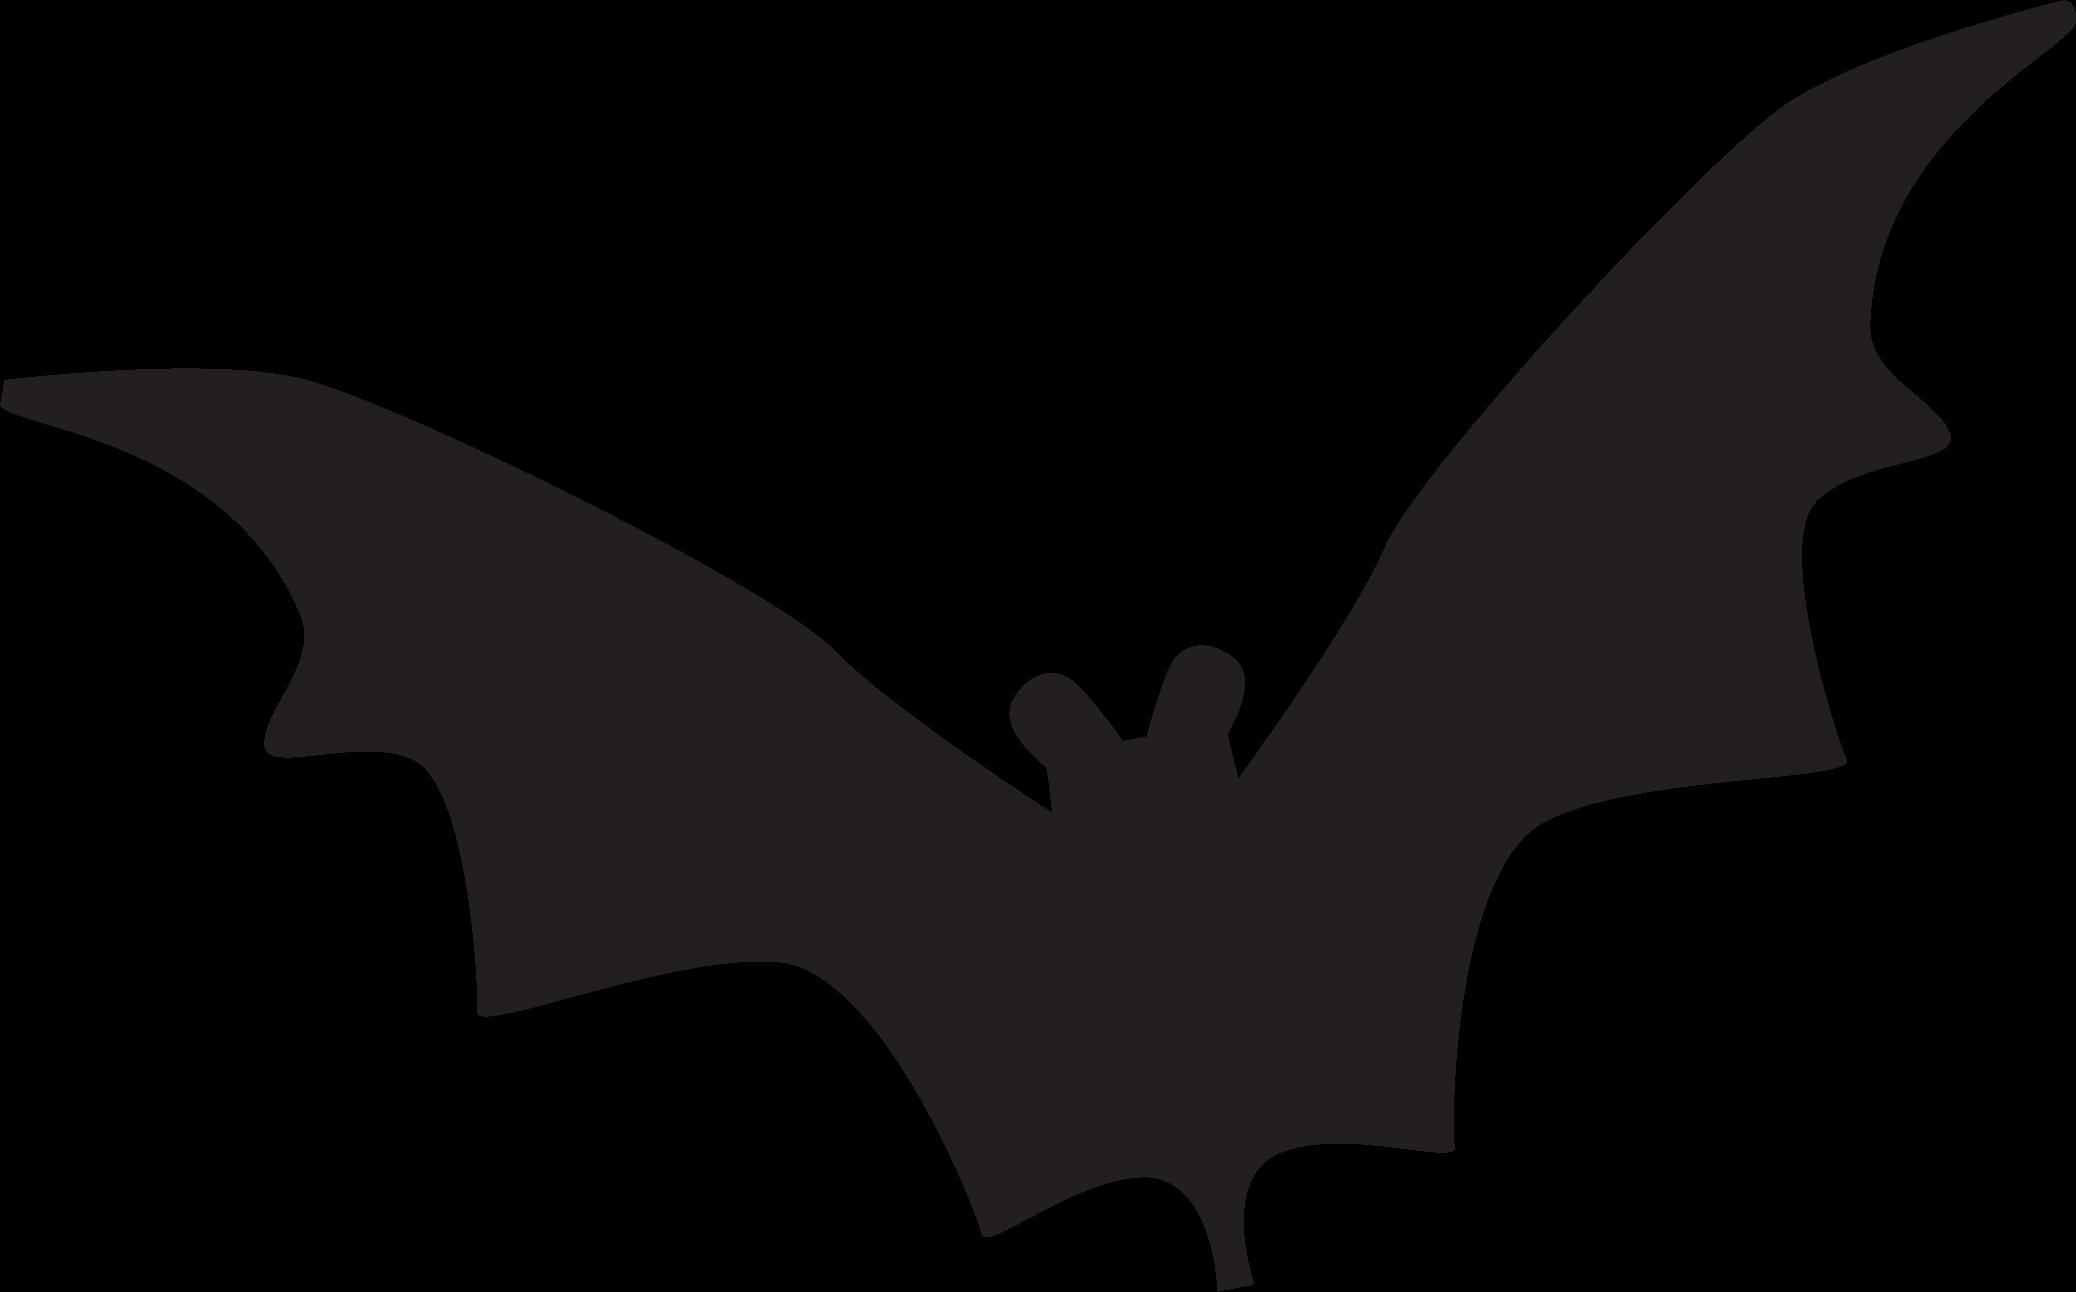 Trick Or Treat Bat SVG Cut File